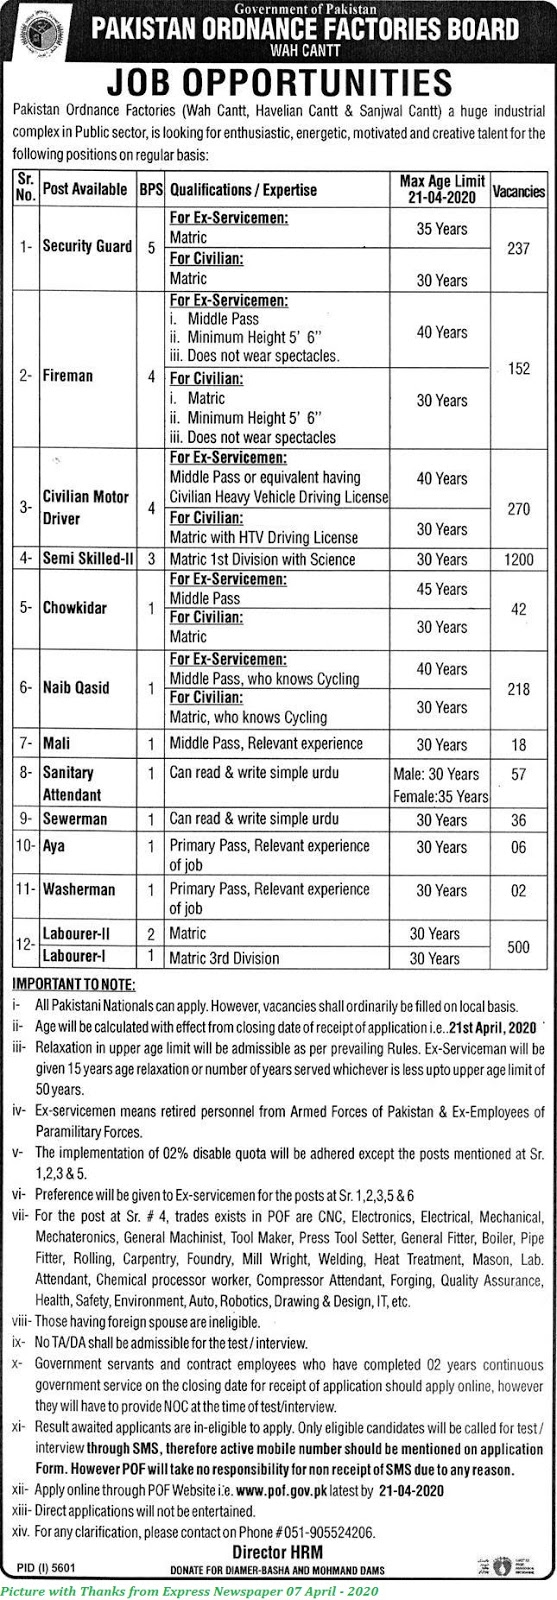 POF Jobs 2020 - Latest Jobs in Pakistan Ordnance Factories Board Apply Online for POF Jobs 2020